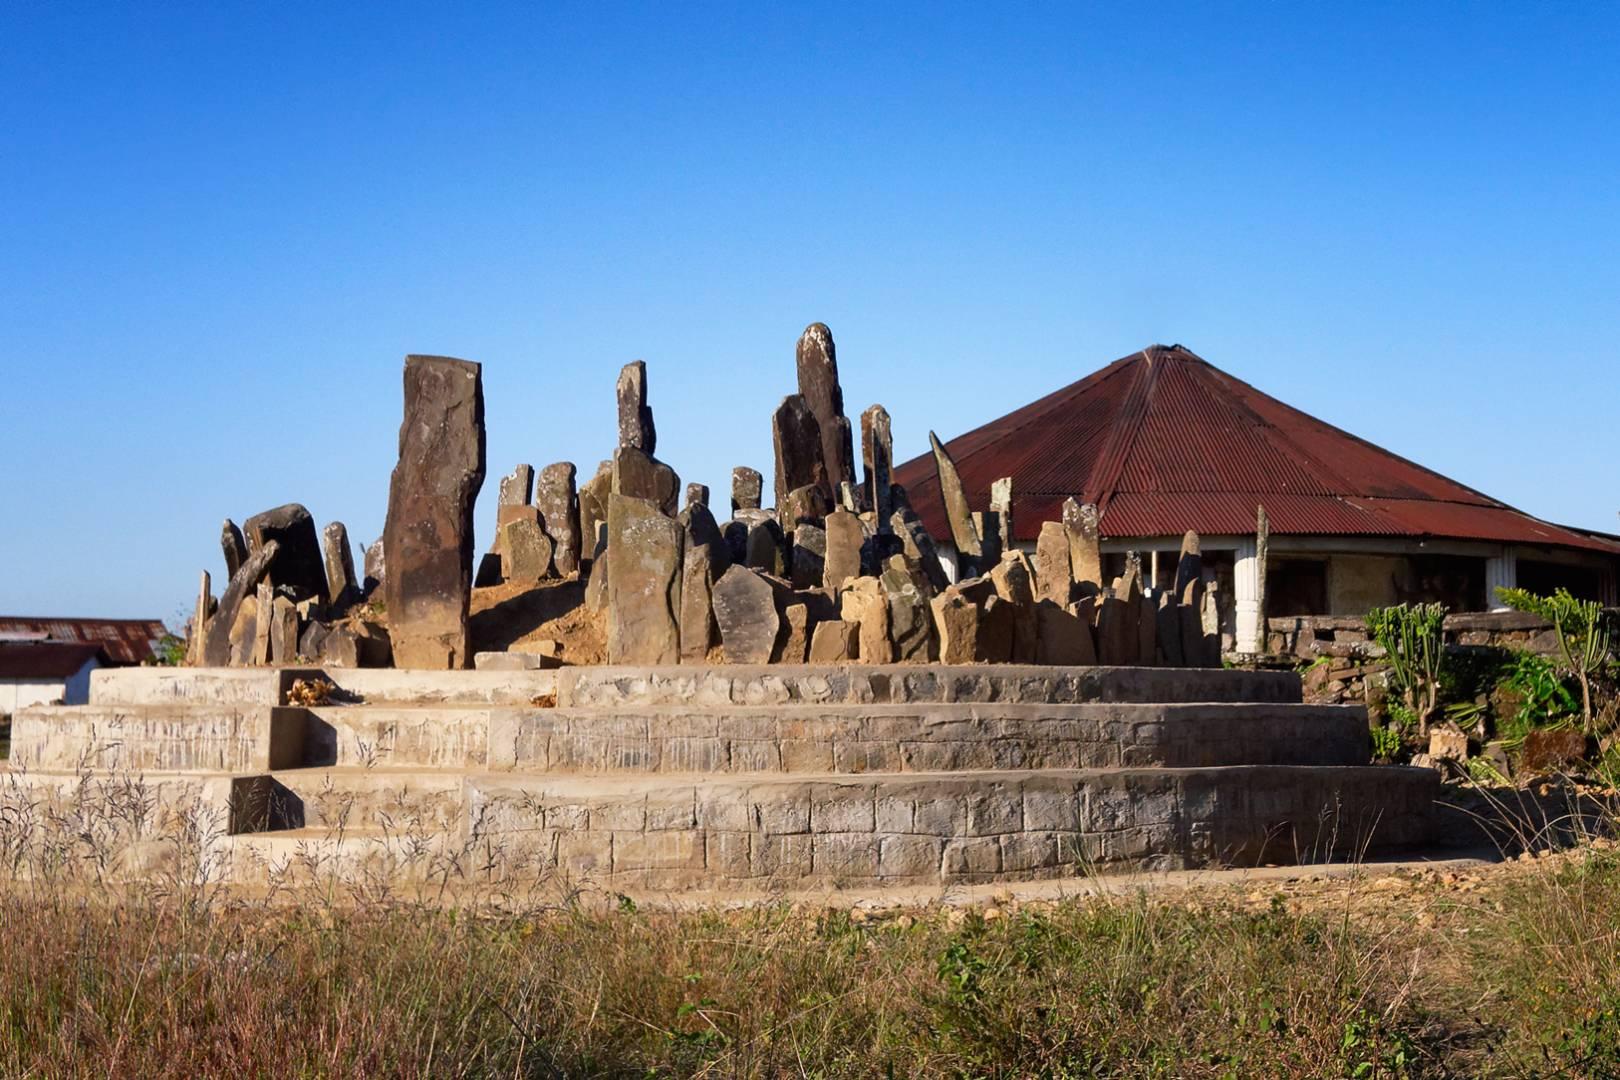 Burial stones in Chui village